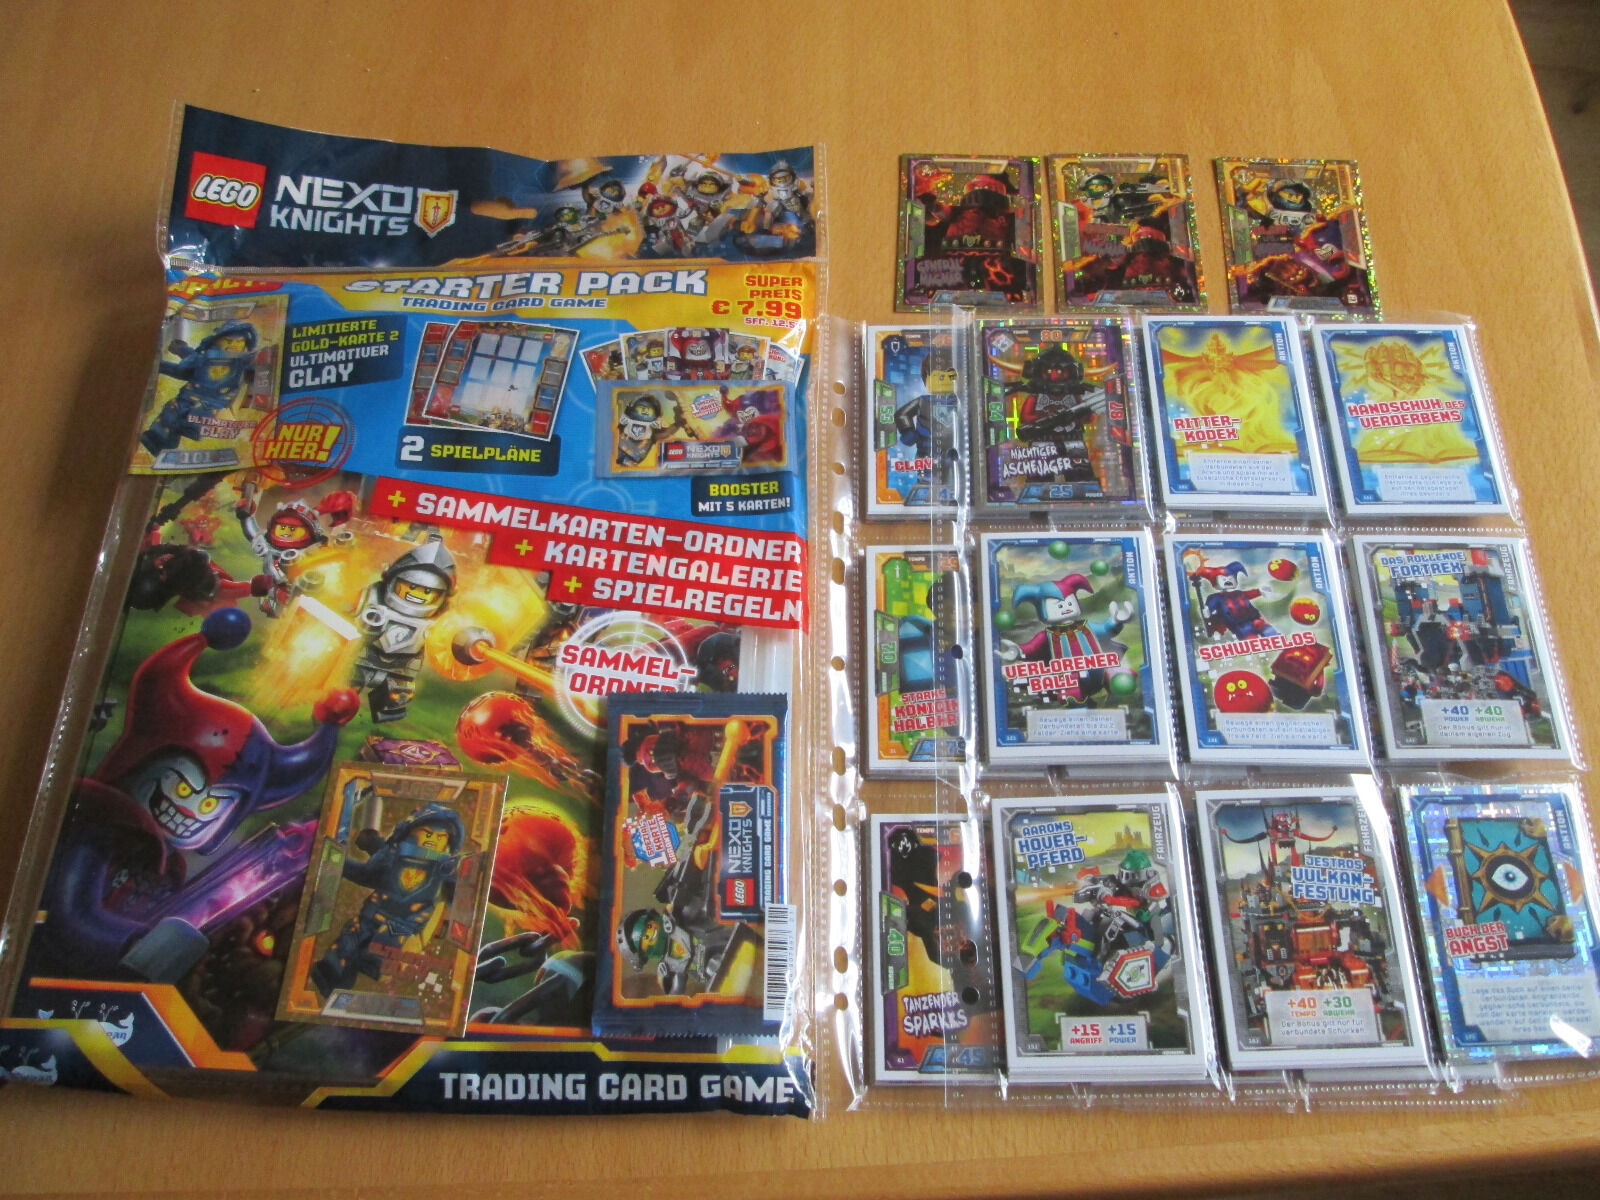 LEGO Nexo Knights Trading Cards KOMPLETT-SATZ-SET (180) + StarterPack inkl. 4 LE